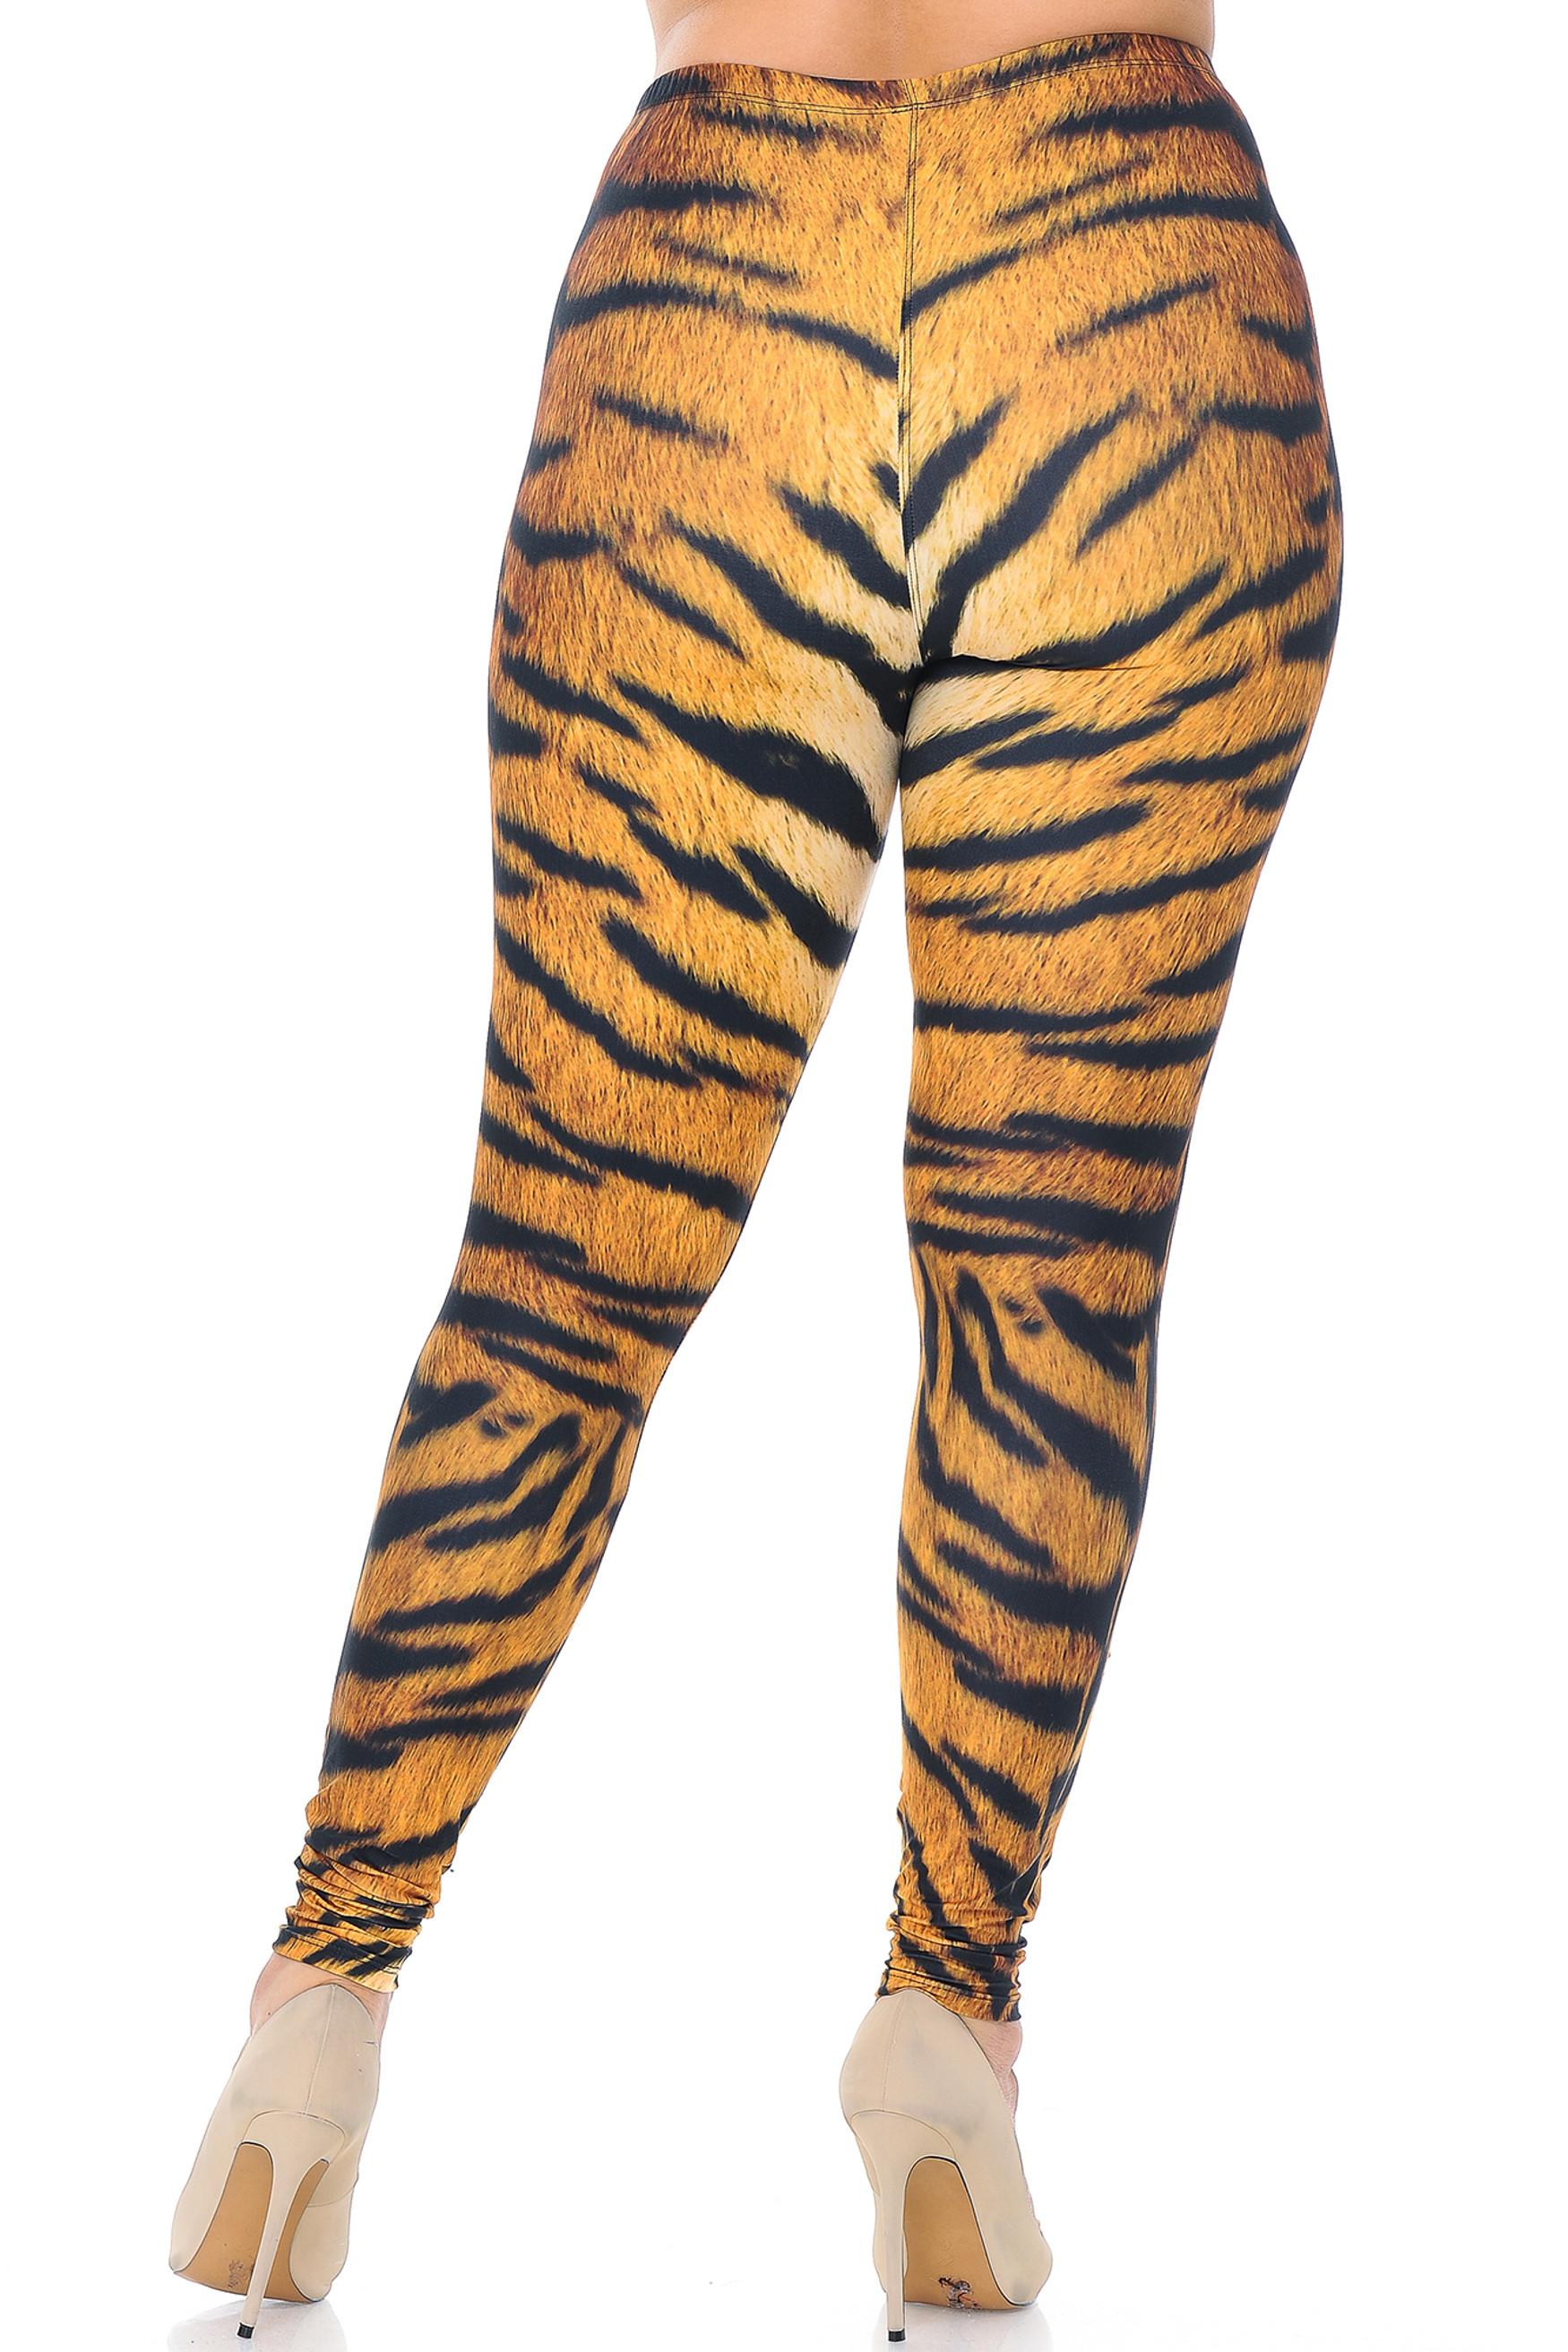 Creamy Soft Tiger Print Plus Size Leggings - USA Fashion™